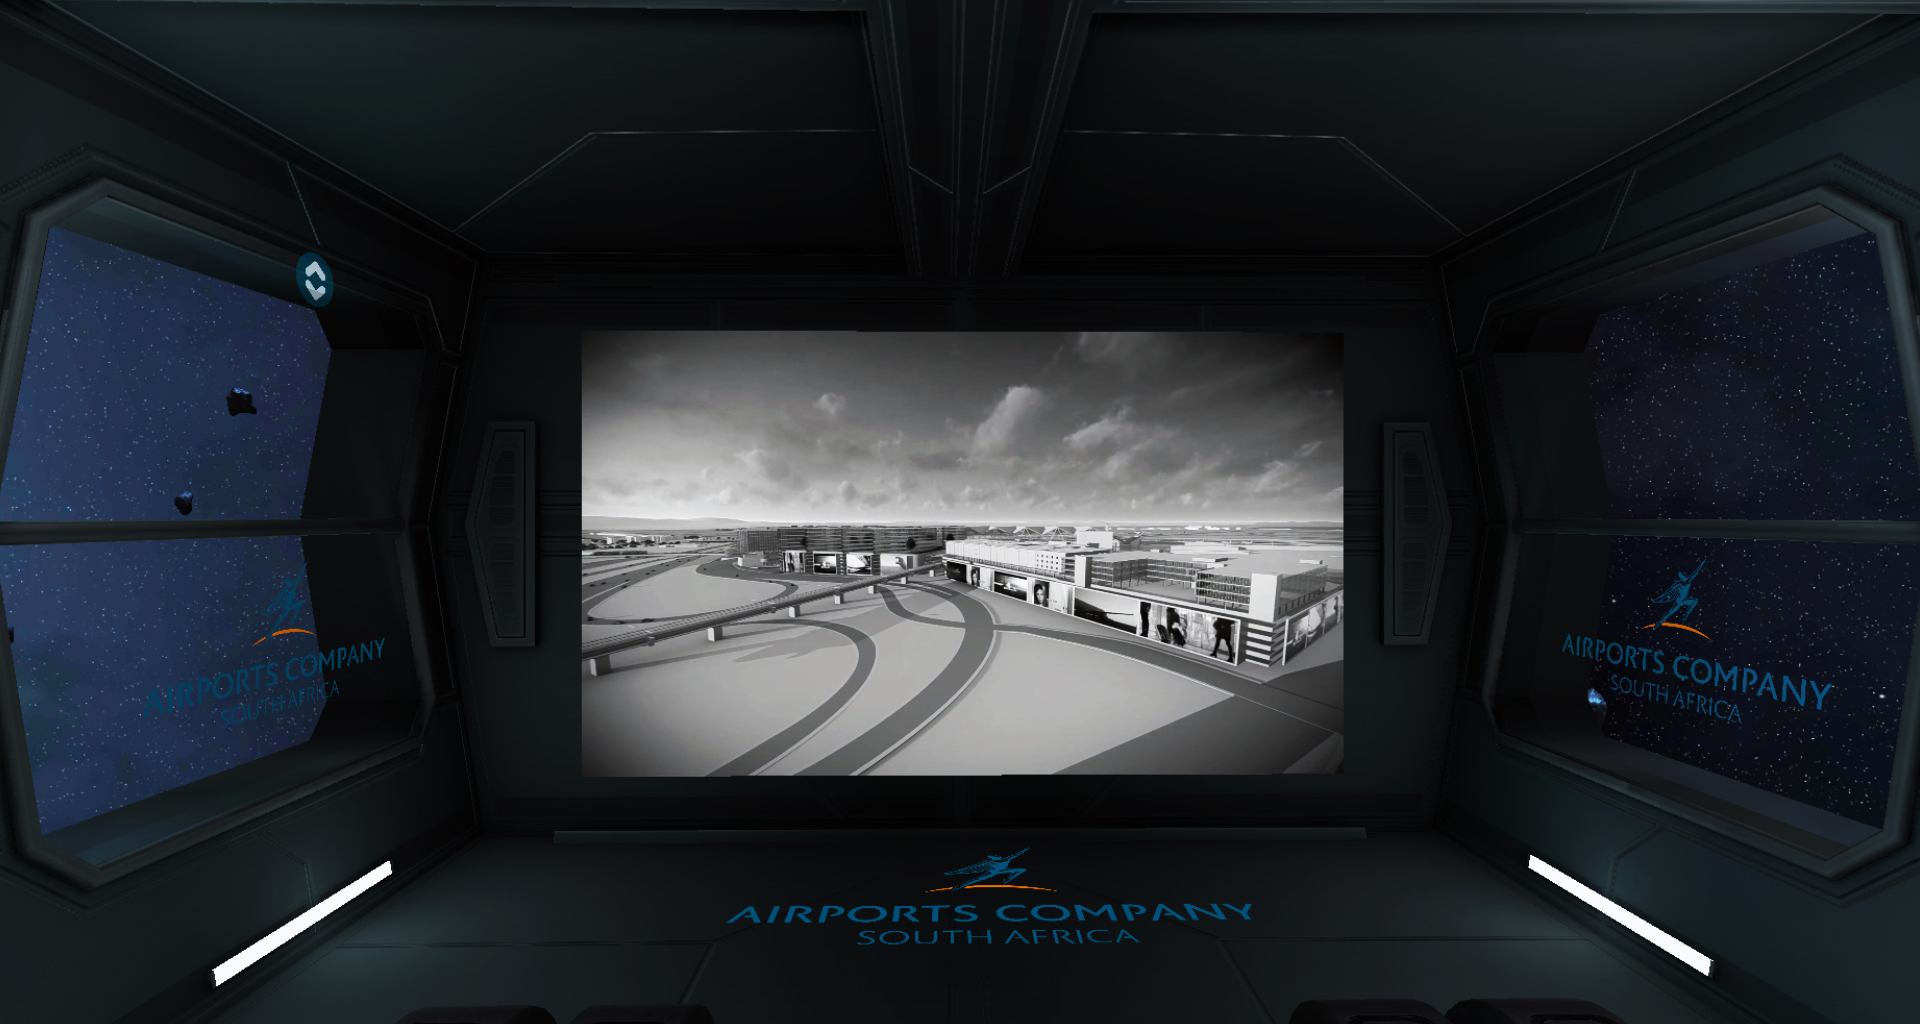 acsa-virtual-reality-experience